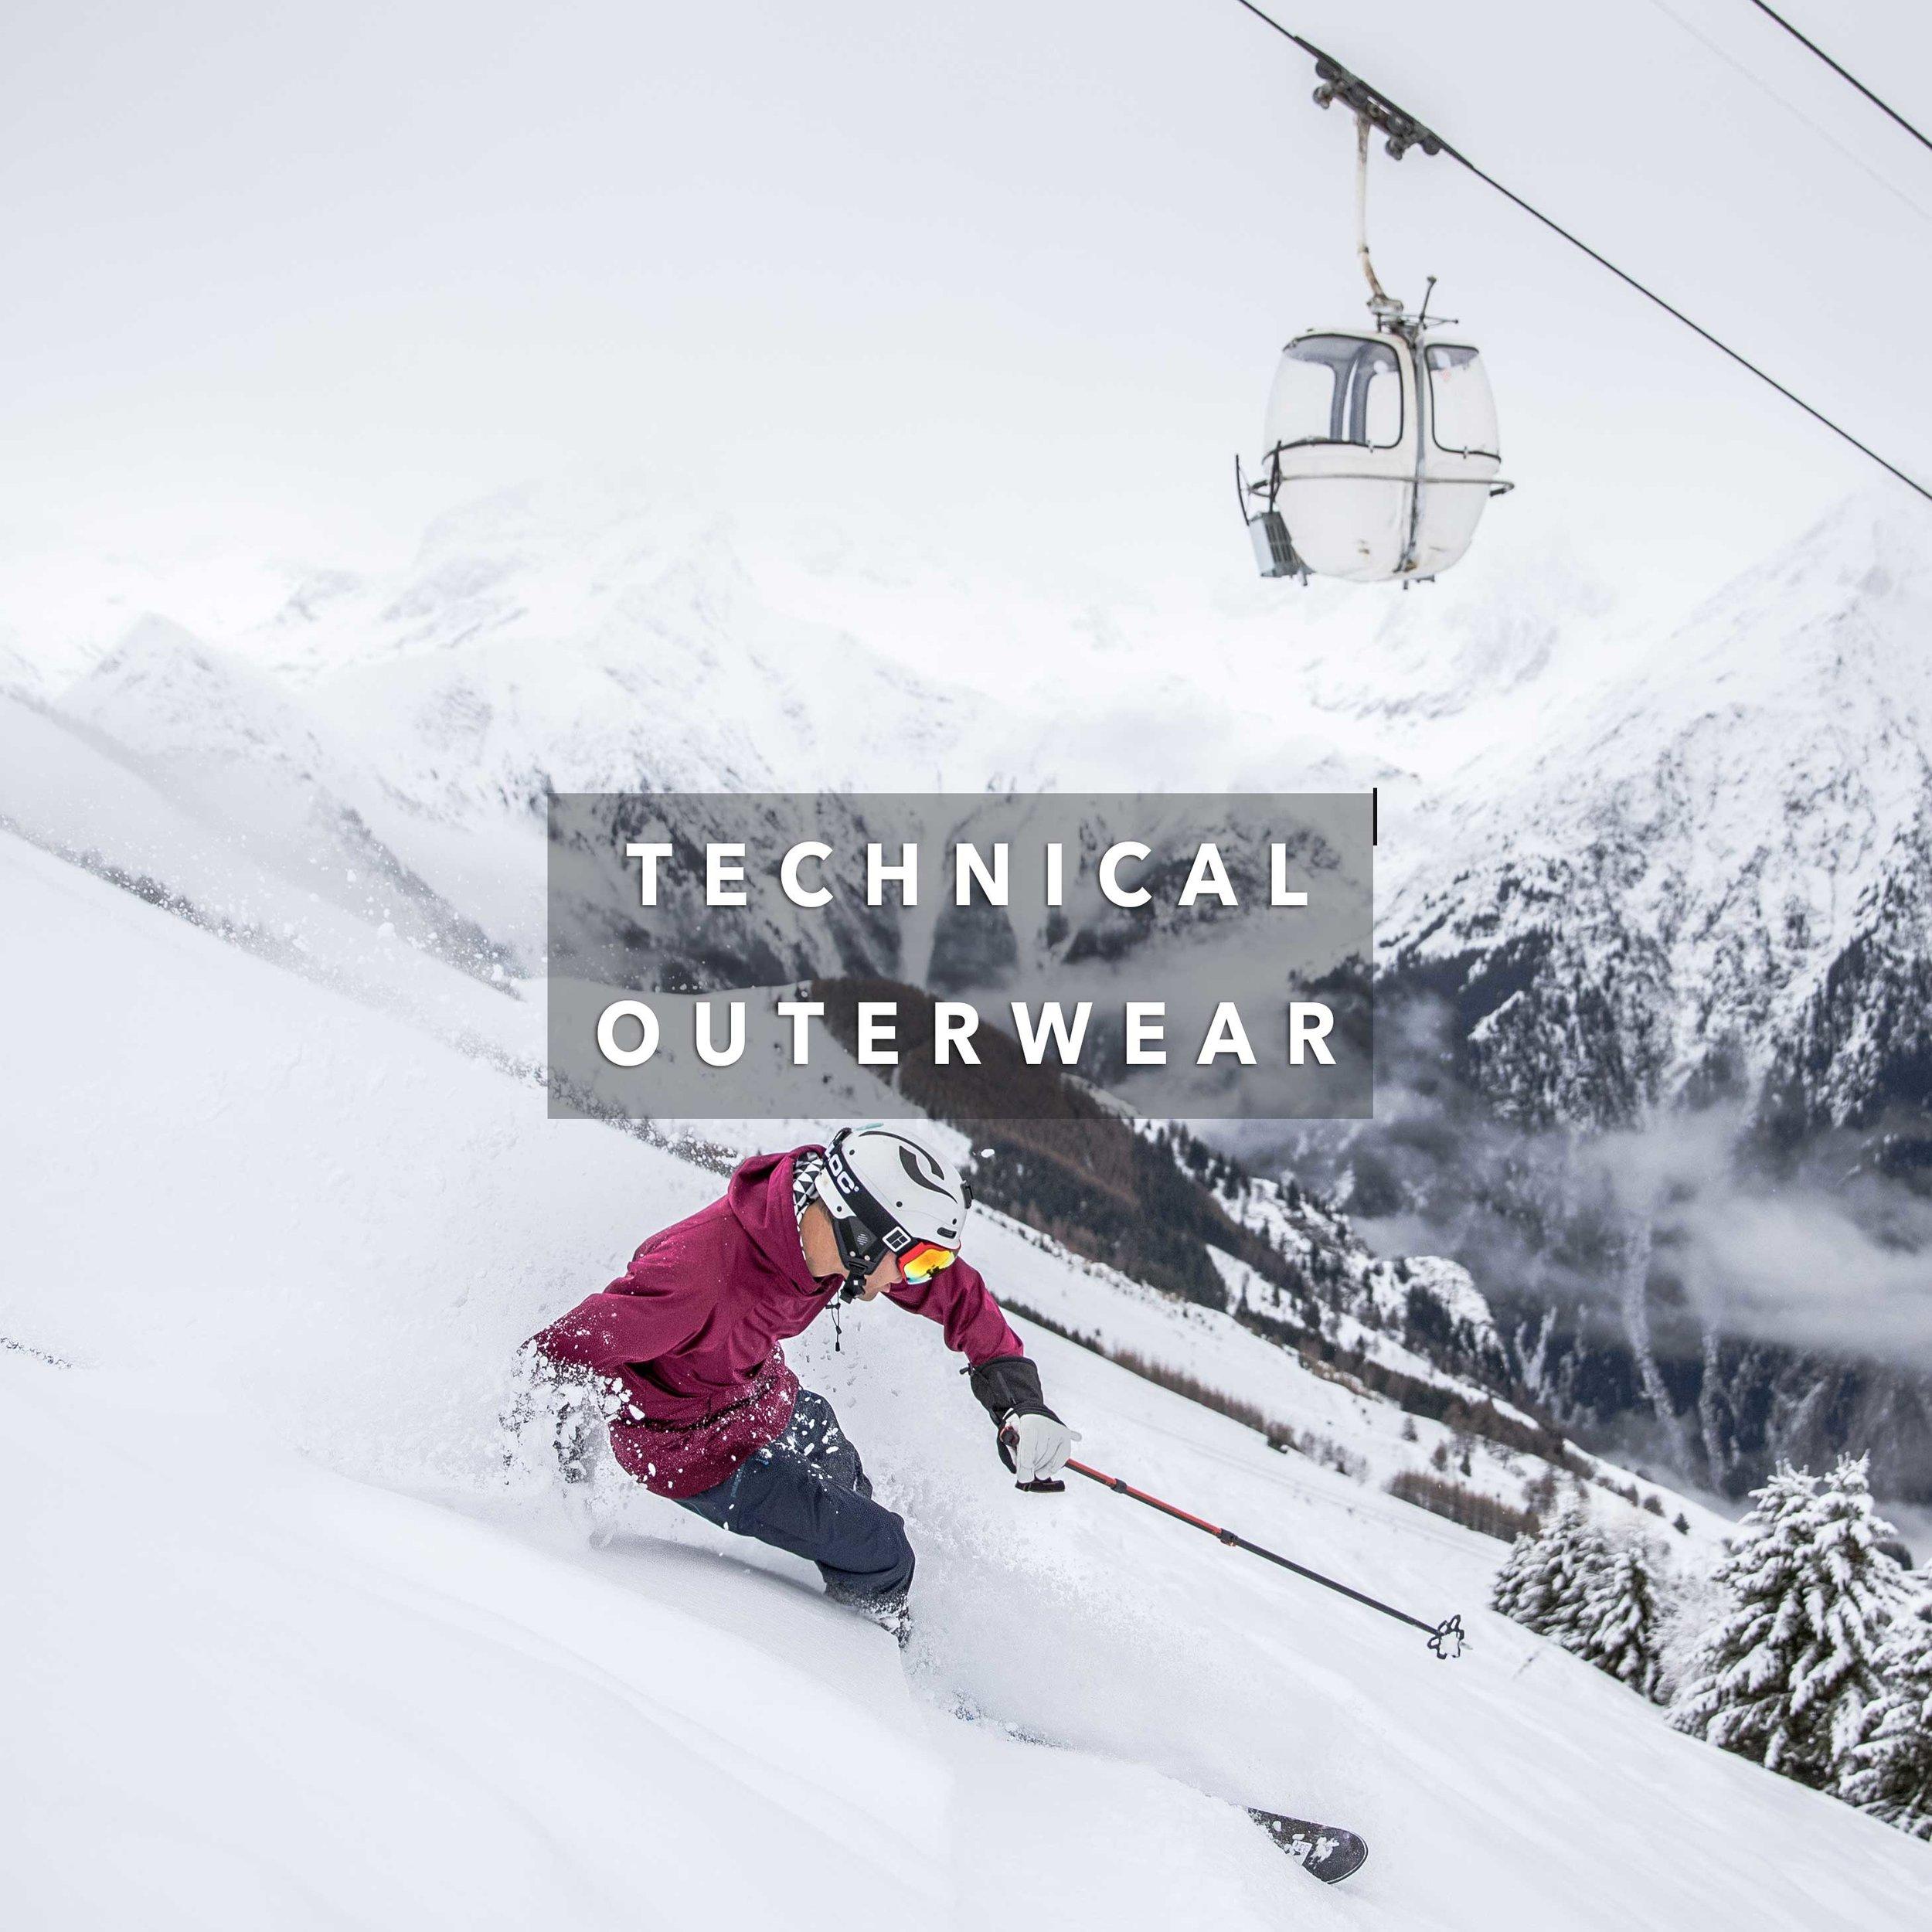 Technical Outerwear